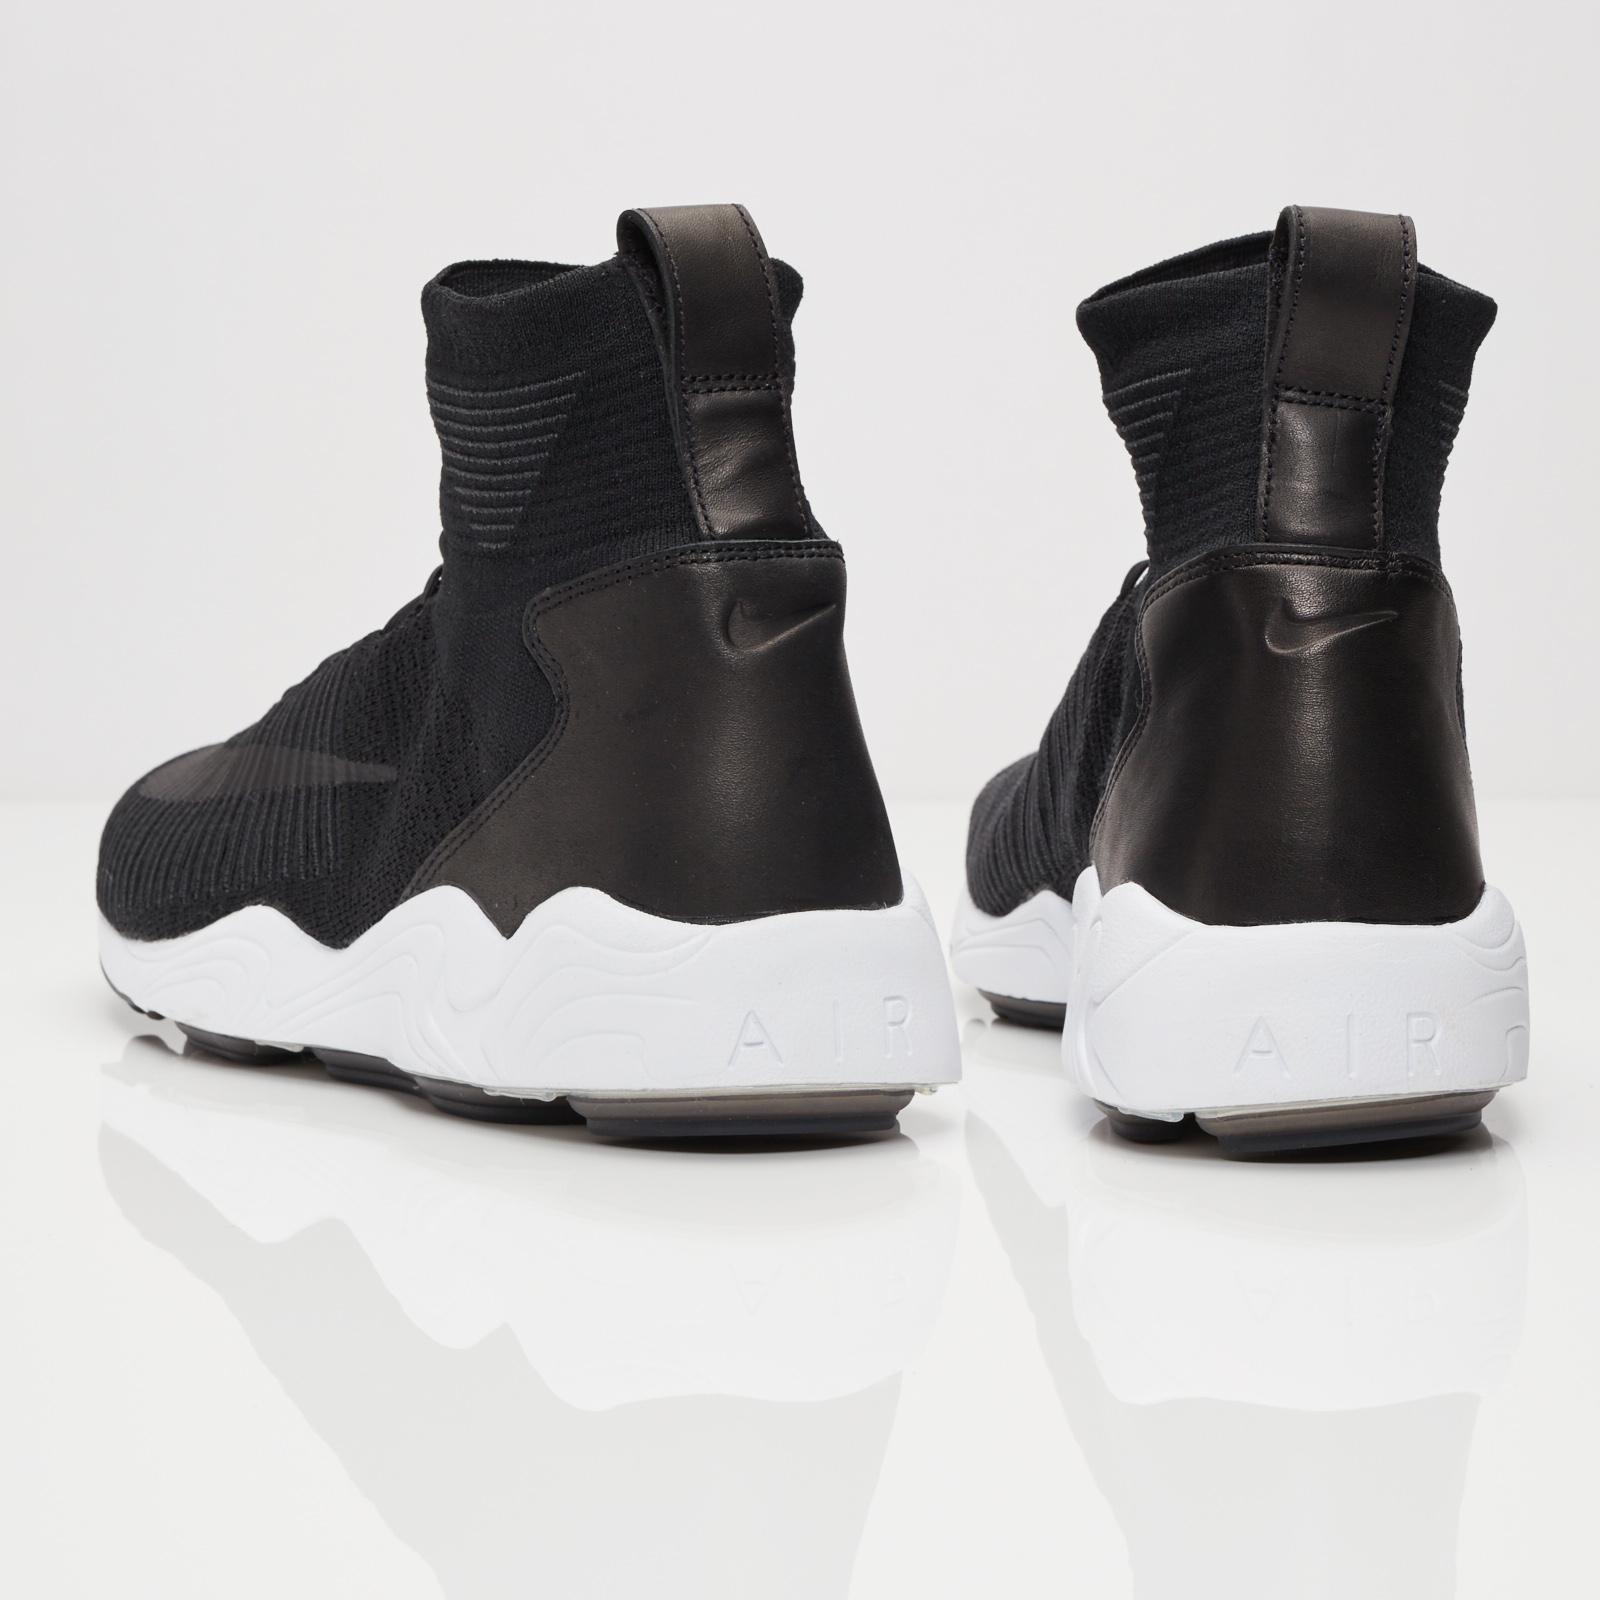 91305187e2b Nike Zoom Mercurial XI FK - 844626-001 - Sneakersnstuff